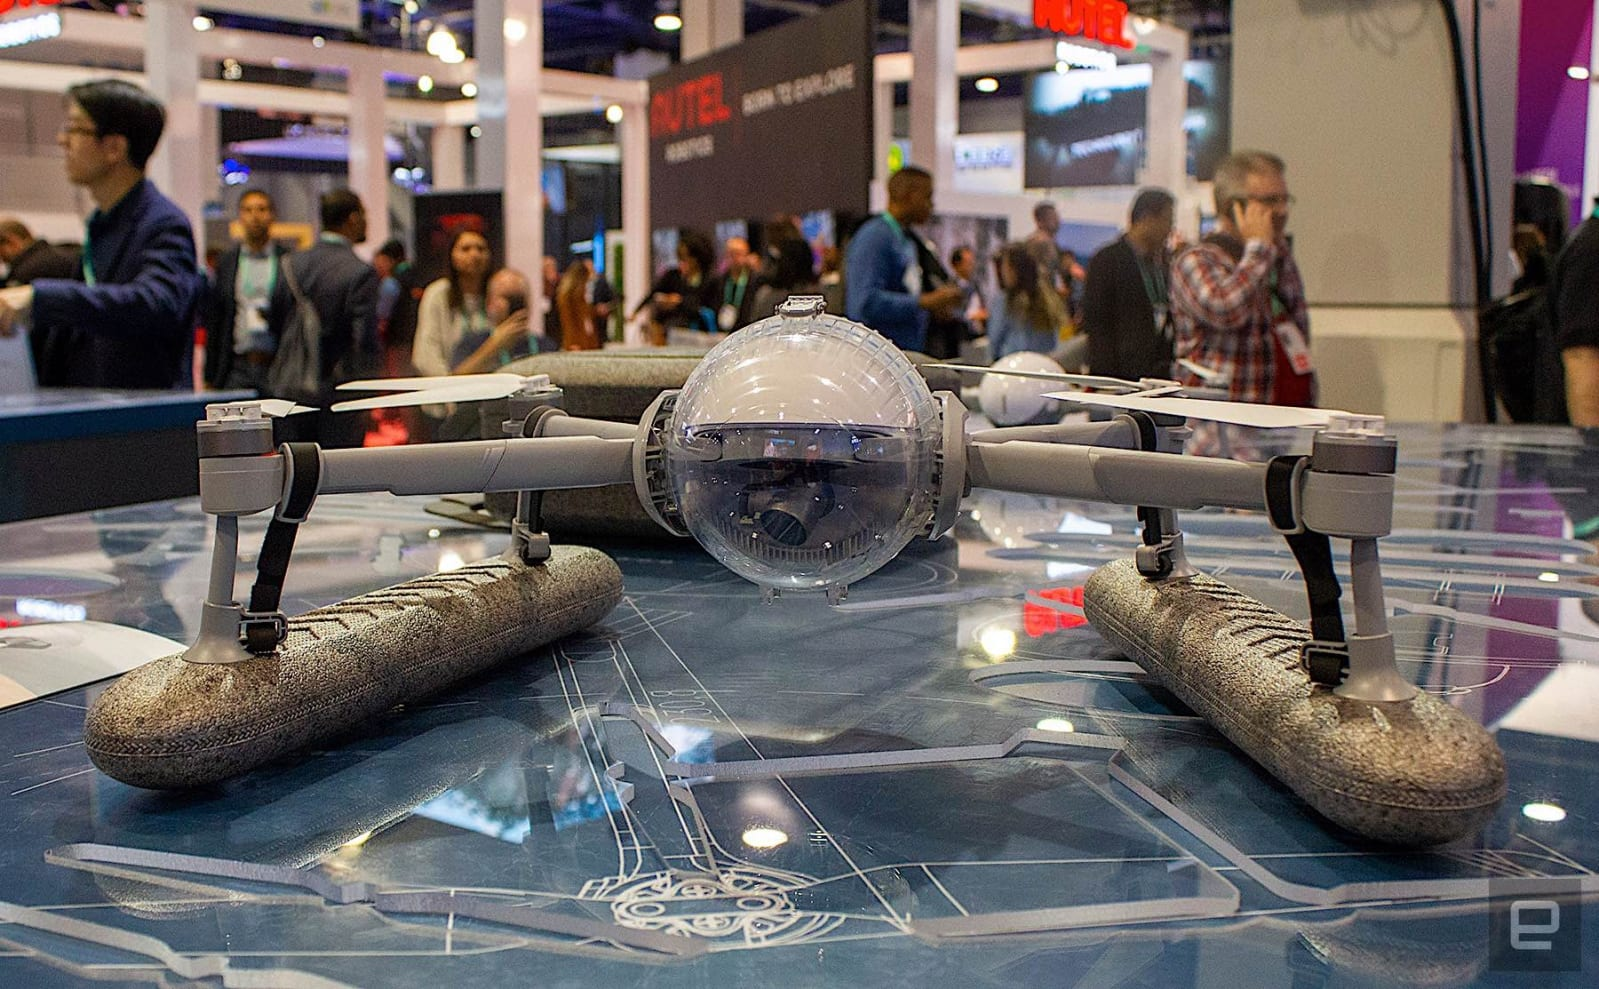 PowerEgg X drone